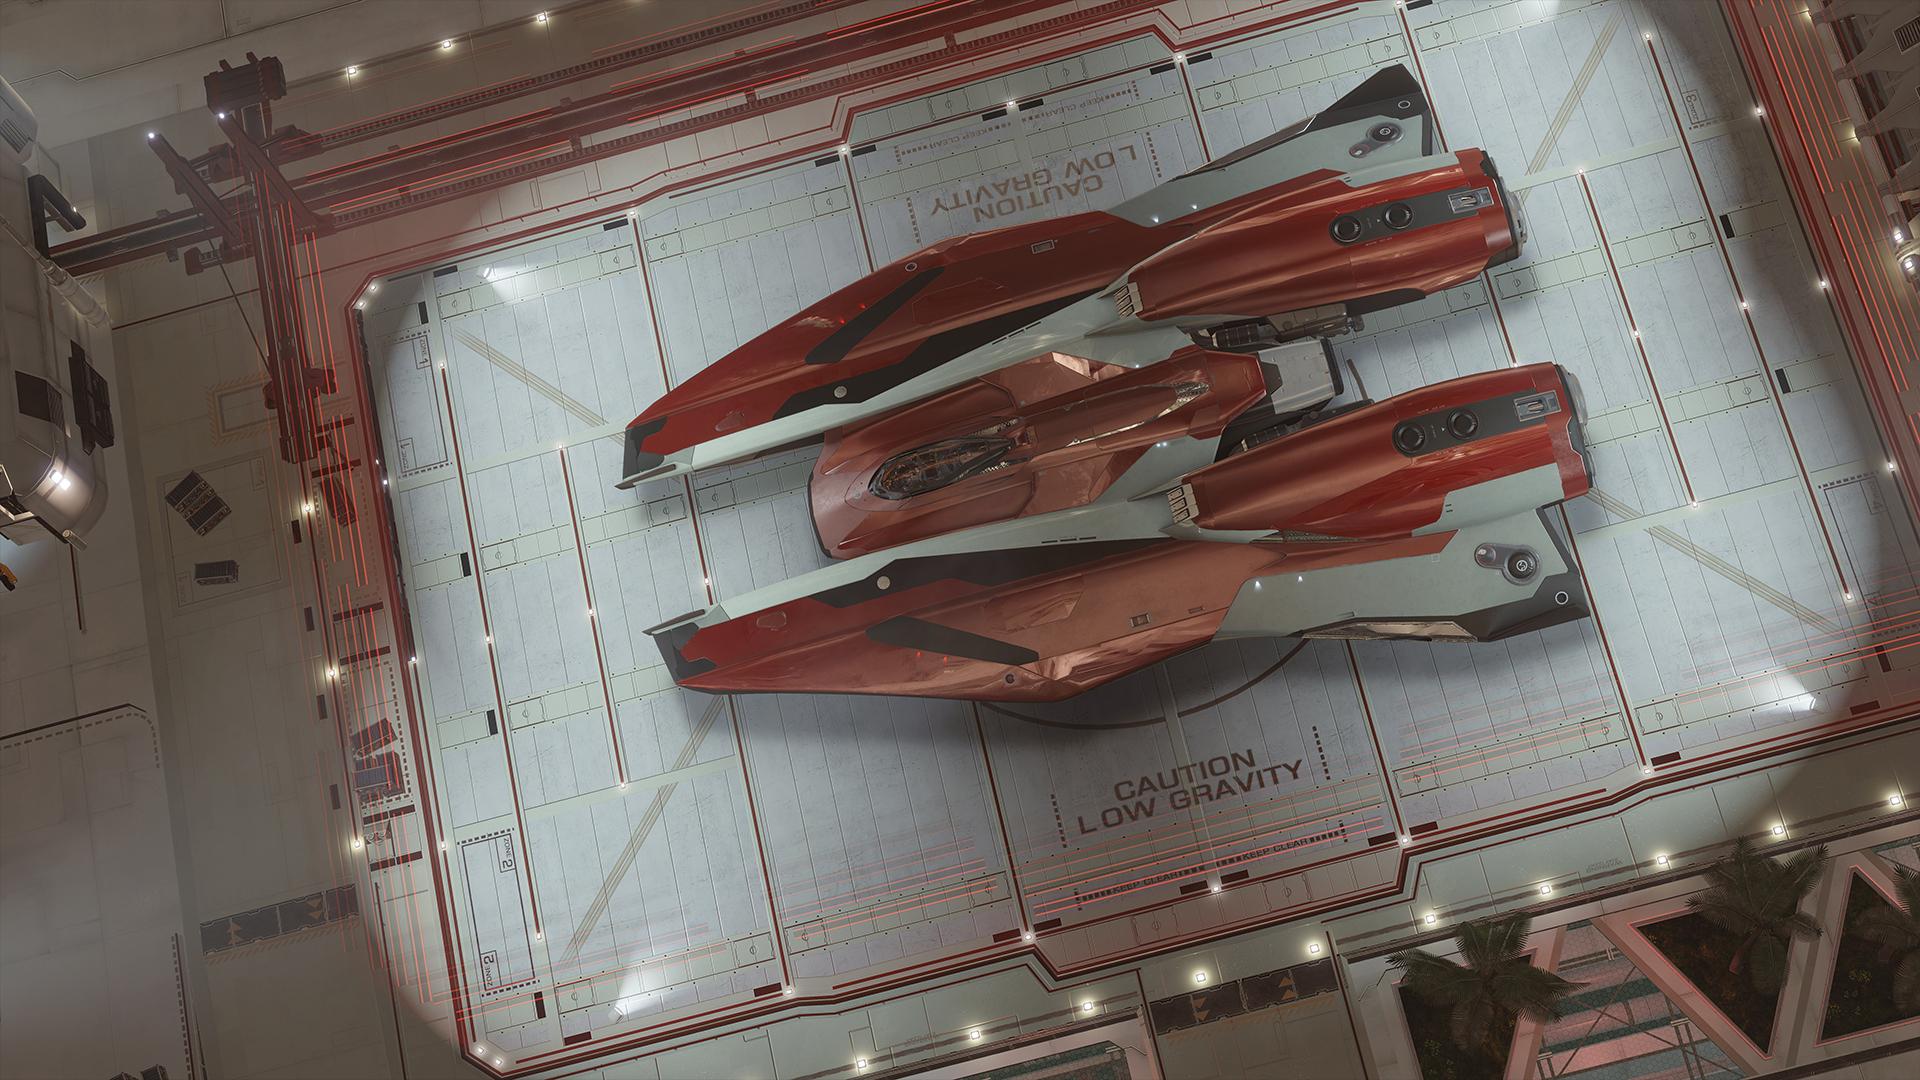 Check out Elite Dangerous' sleek new ship, the Mamba | PC Gamer